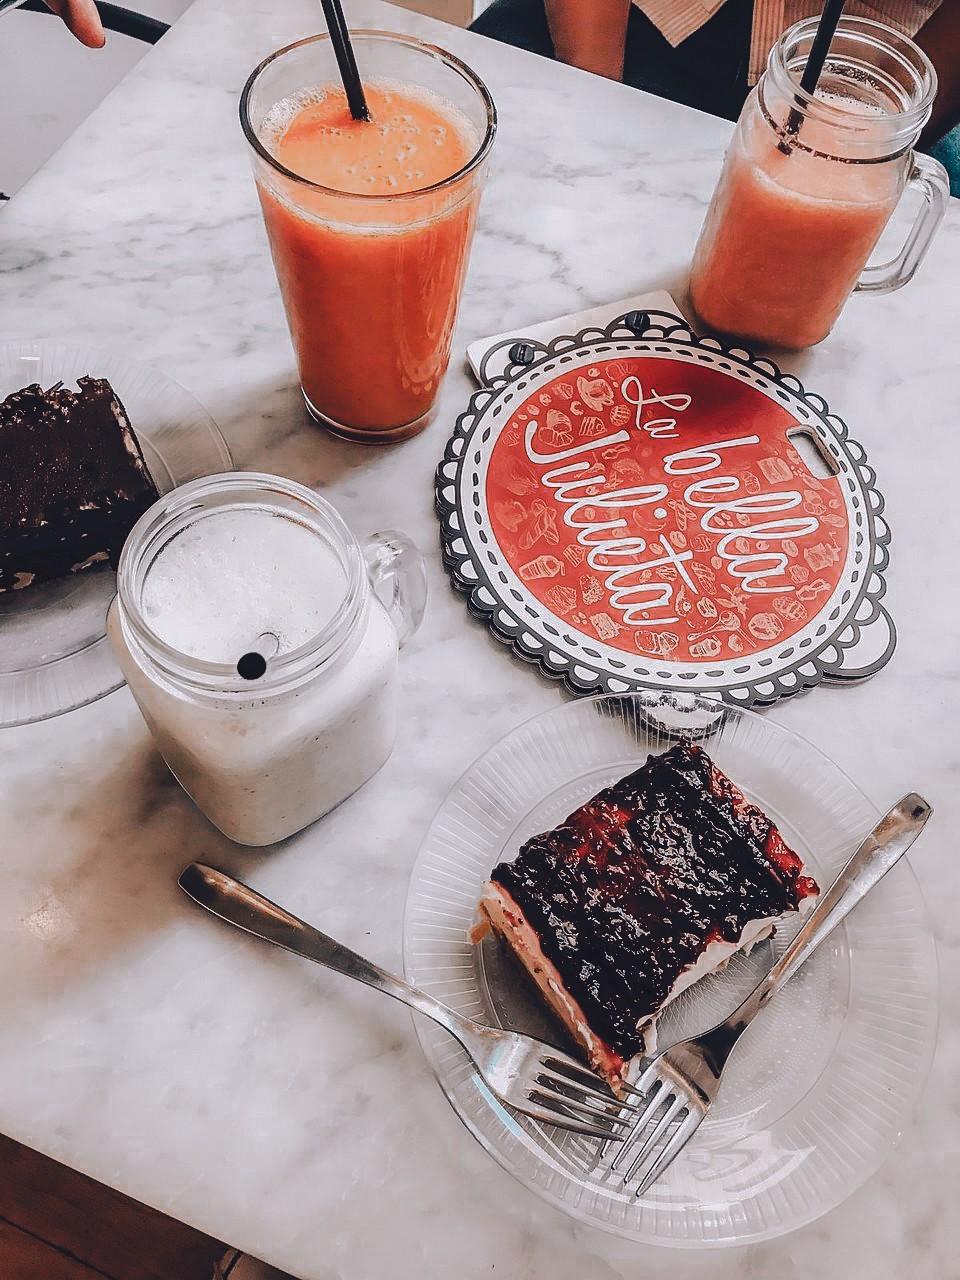 La Bella Julieta food choices Malaga